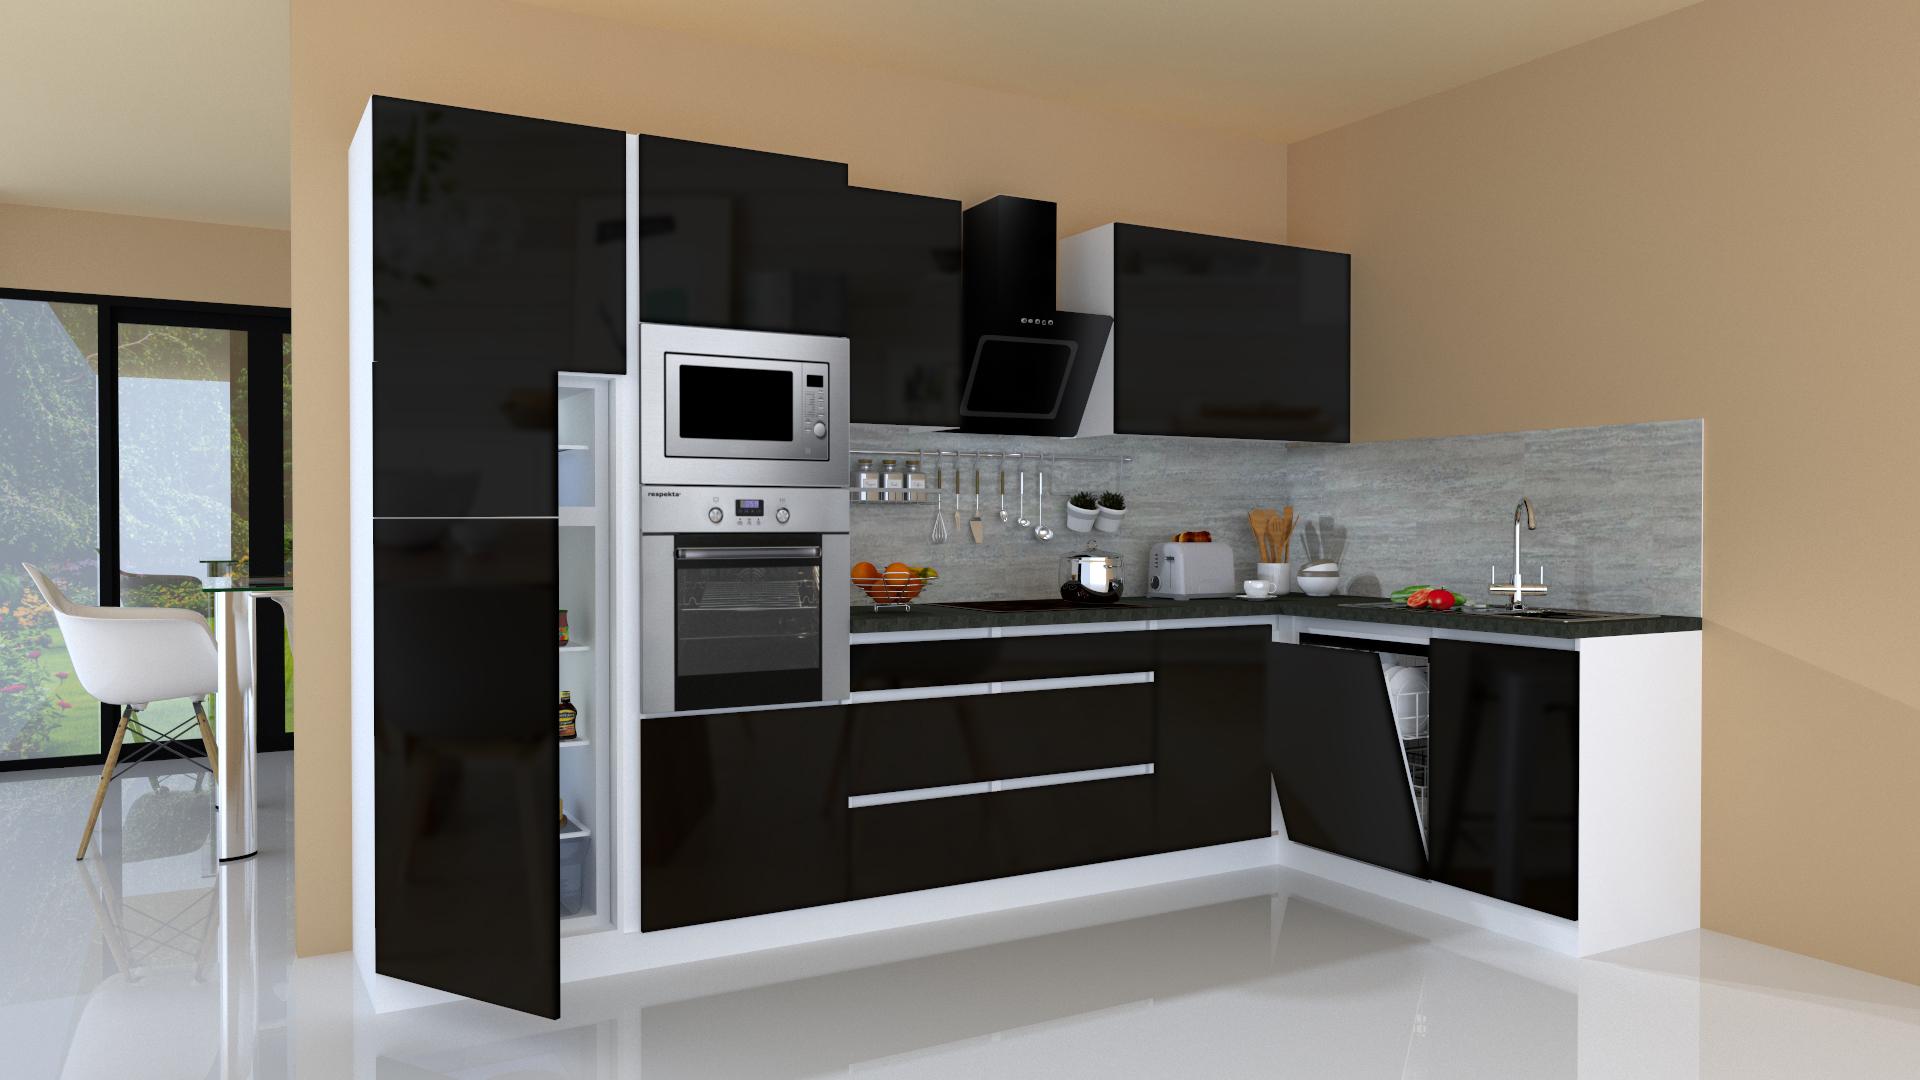 Dettagli su Winkelküche Cucinino Cucina L-FORMA senza Maniglie Nero 345x172  cm Respekta